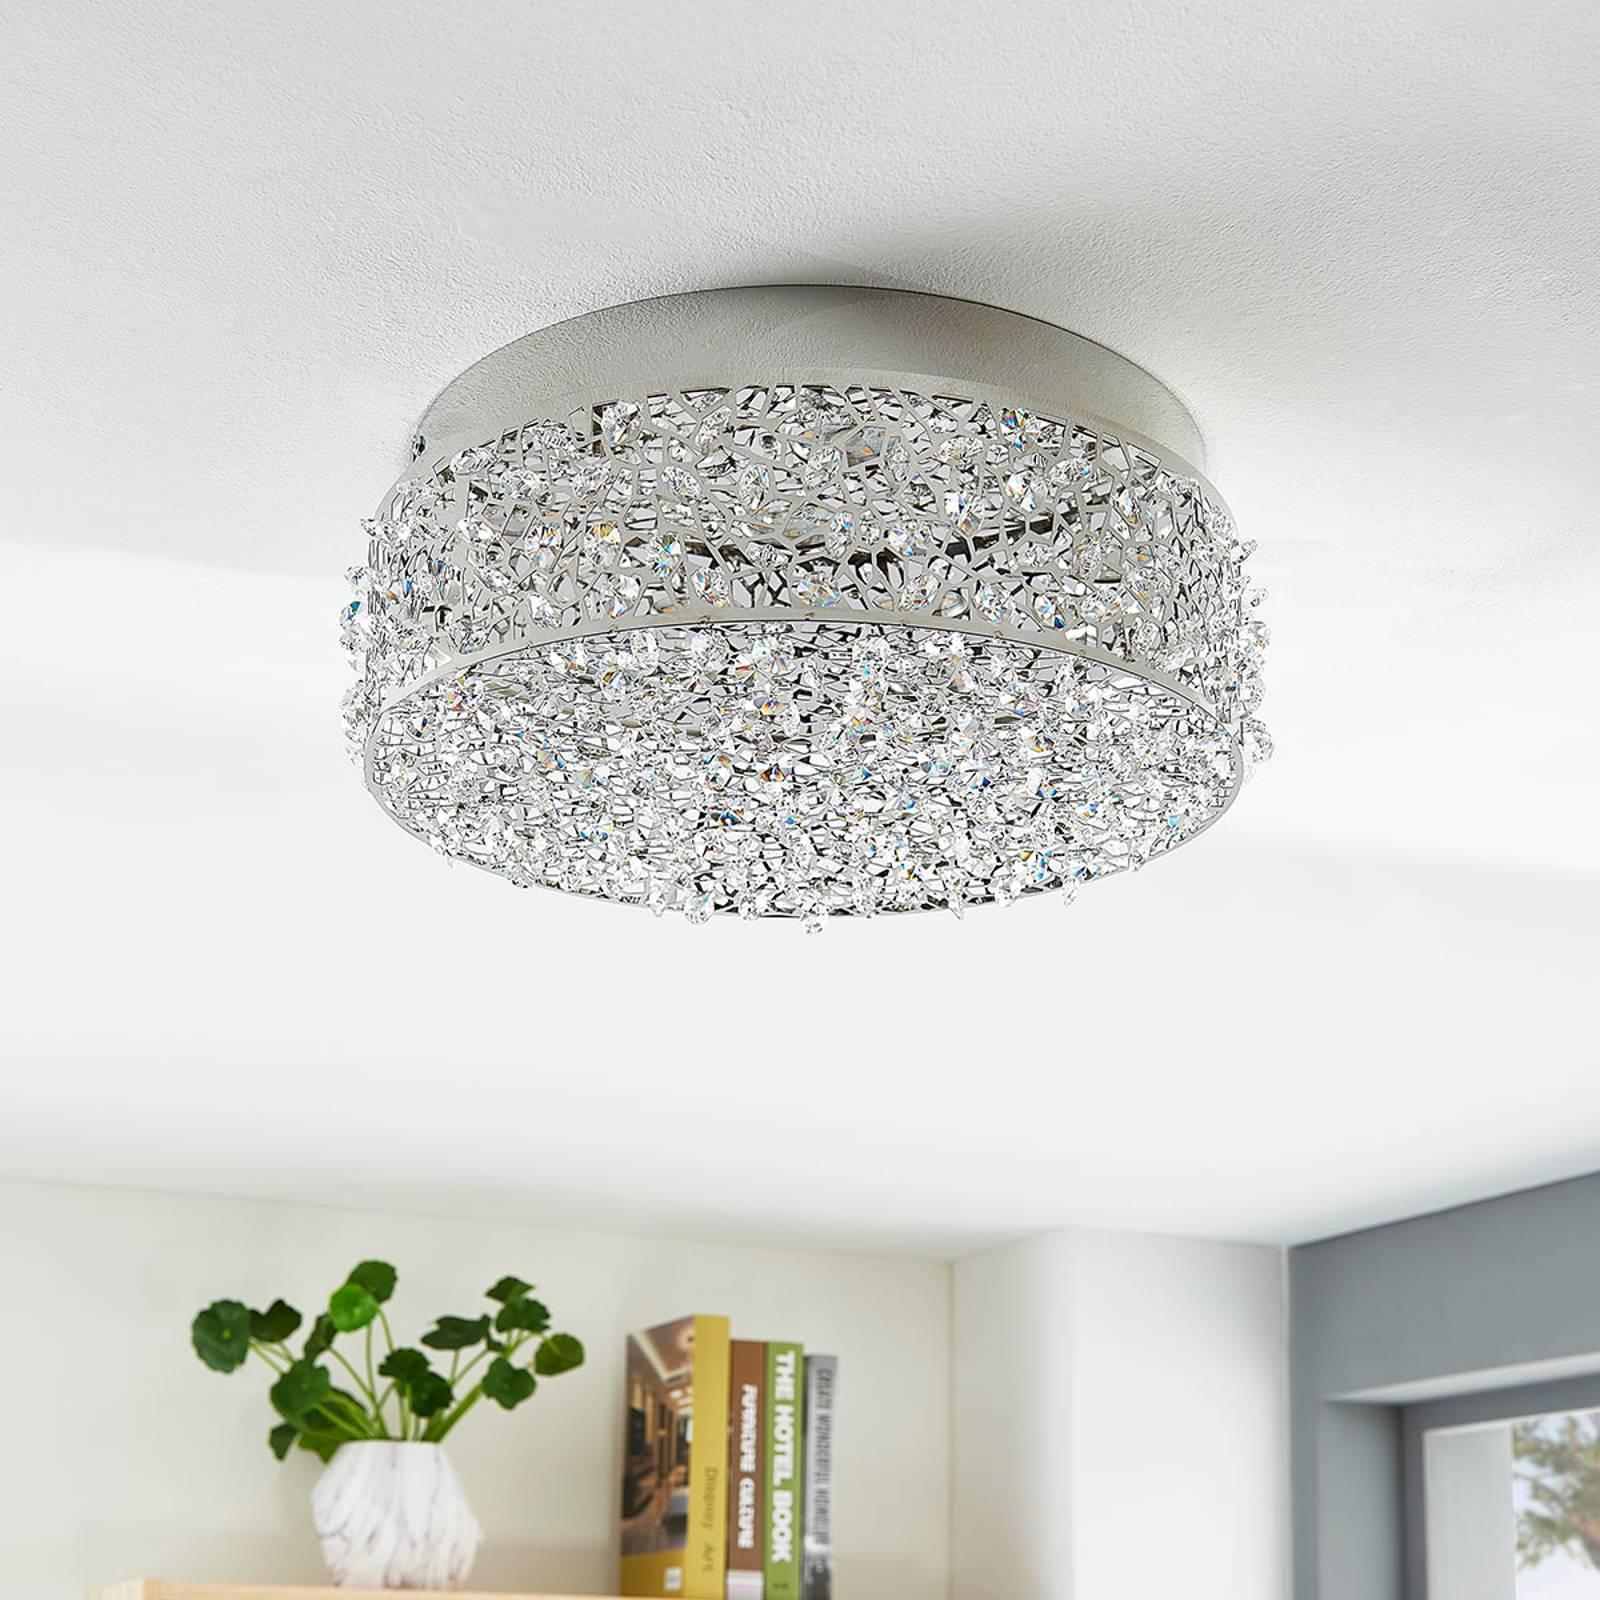 Kimalteleva LED-kattovalaisin Felias, pyöreämuoto